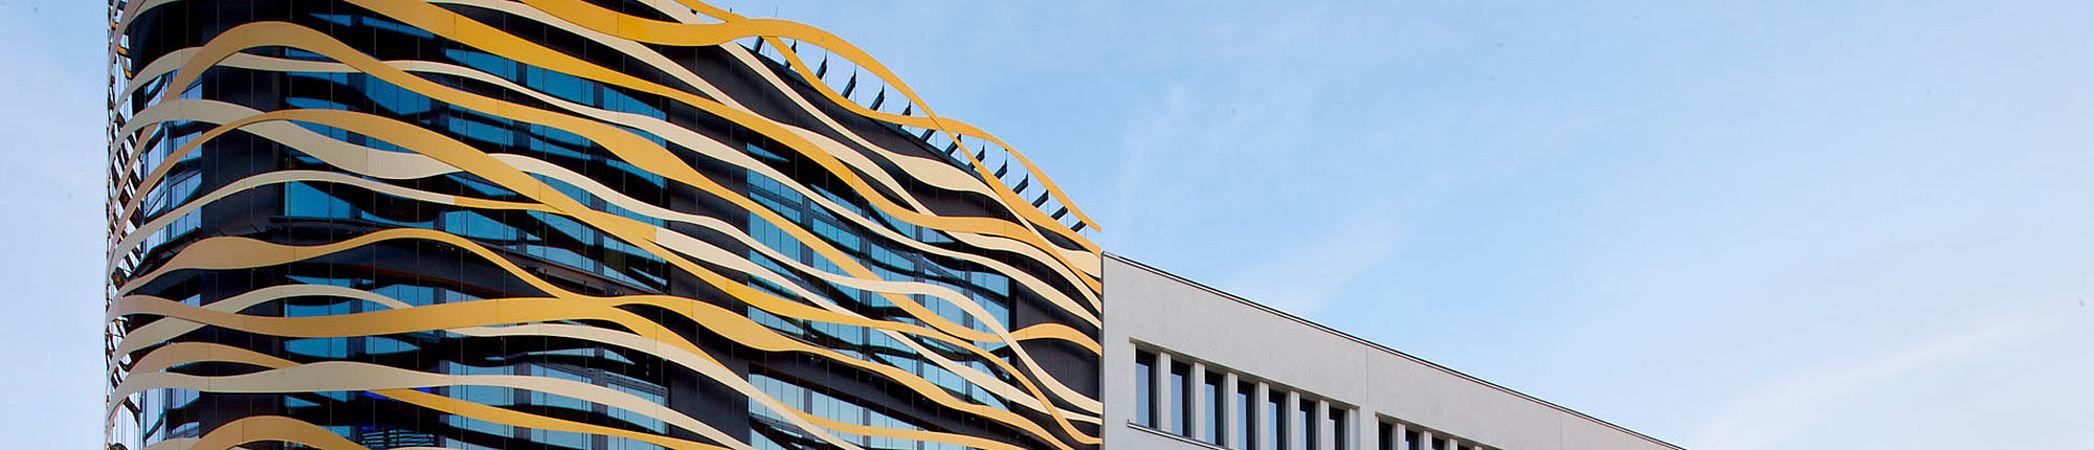 Königsgalerie Duisburg Fassade Edelstahl-Seilsysteme